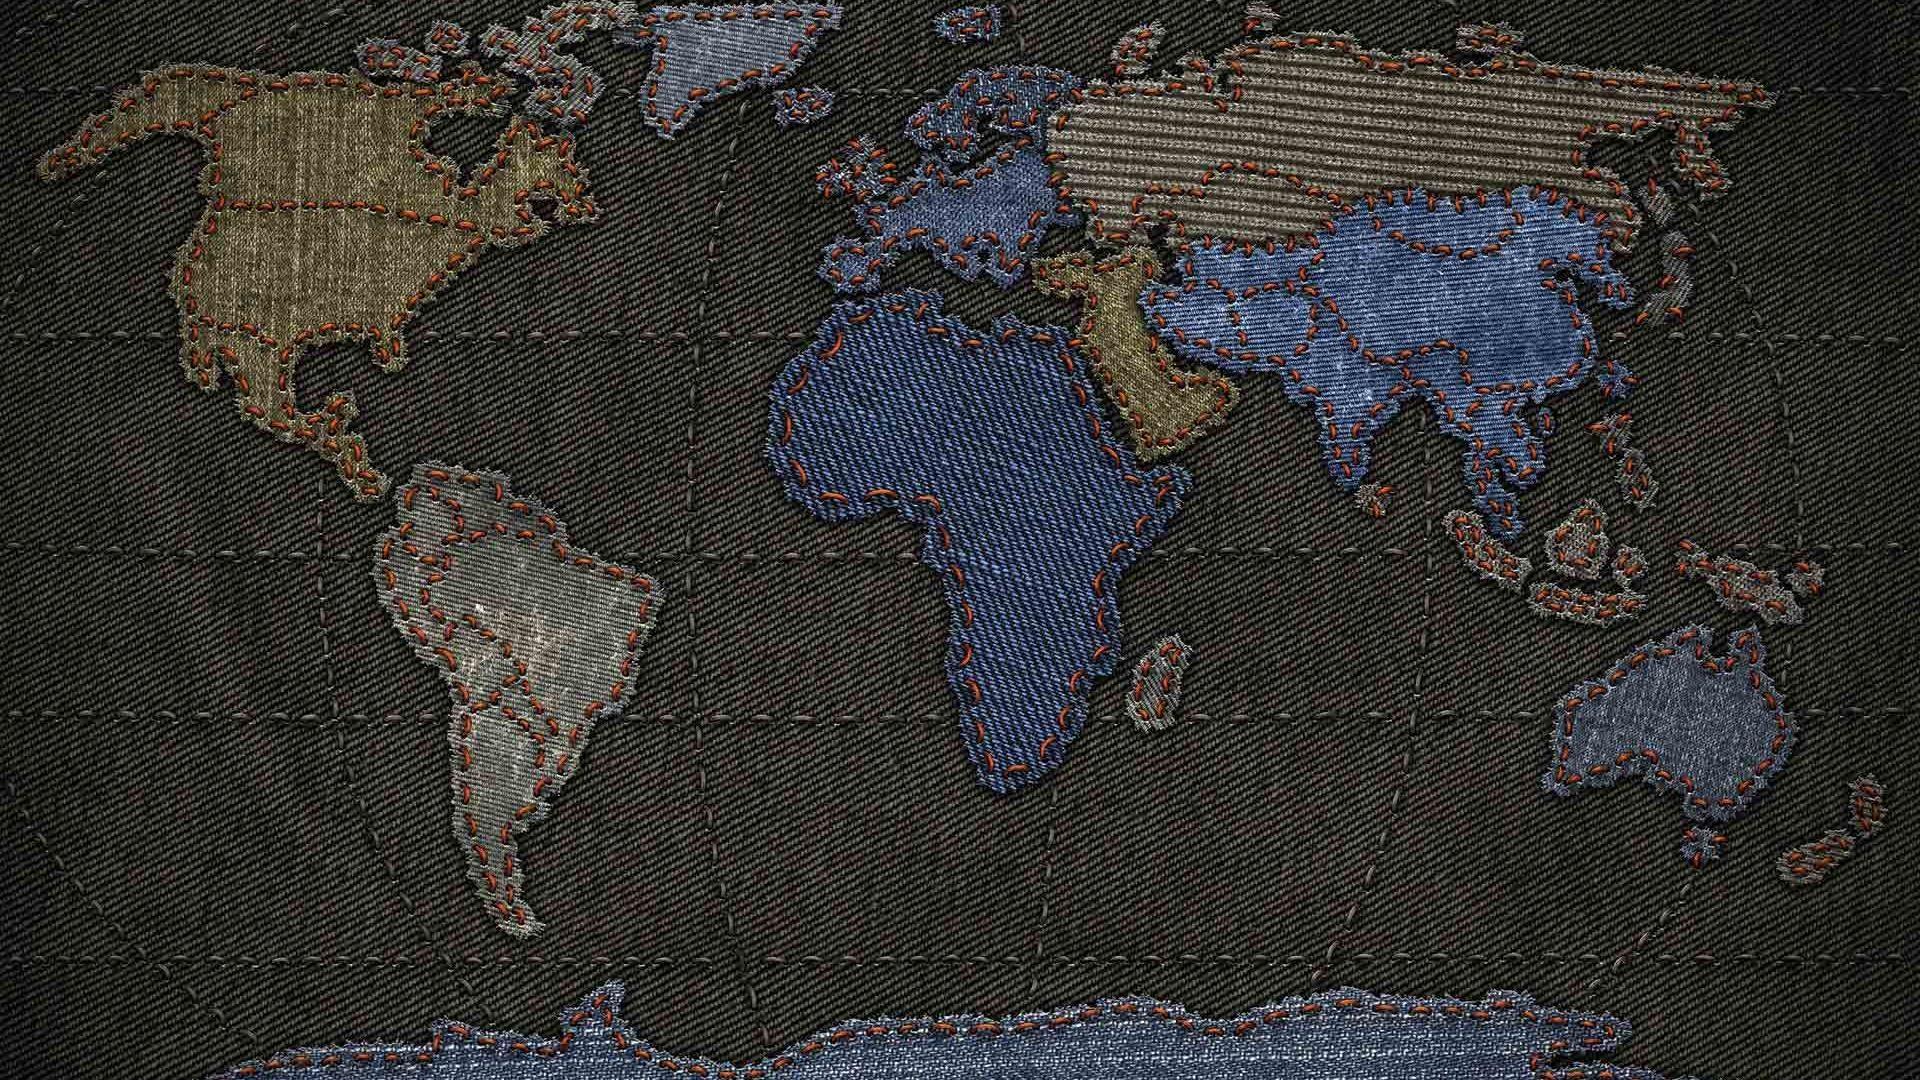 World Map Desktop Wallpaper (54+ images)